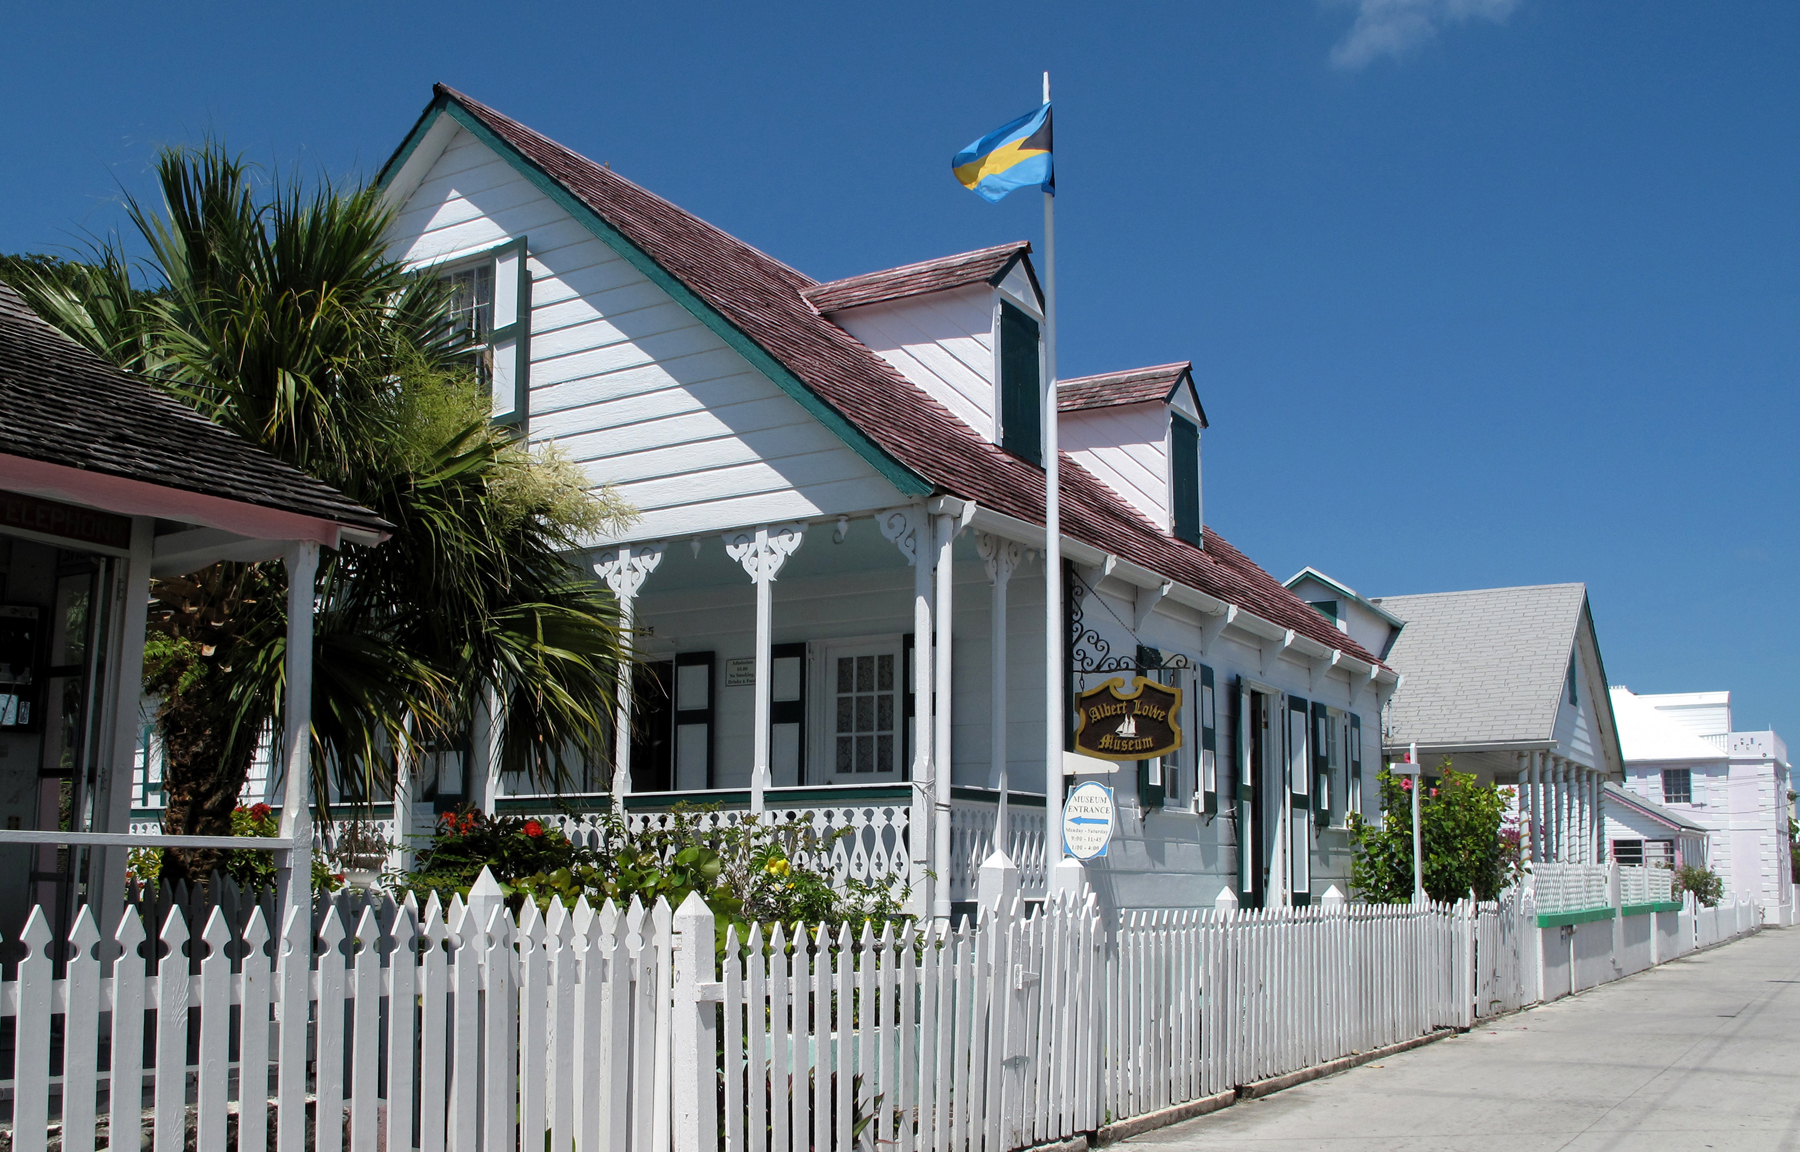 Sale of Custom Heritage Quilt to Benefit the Albert Lowe Museum